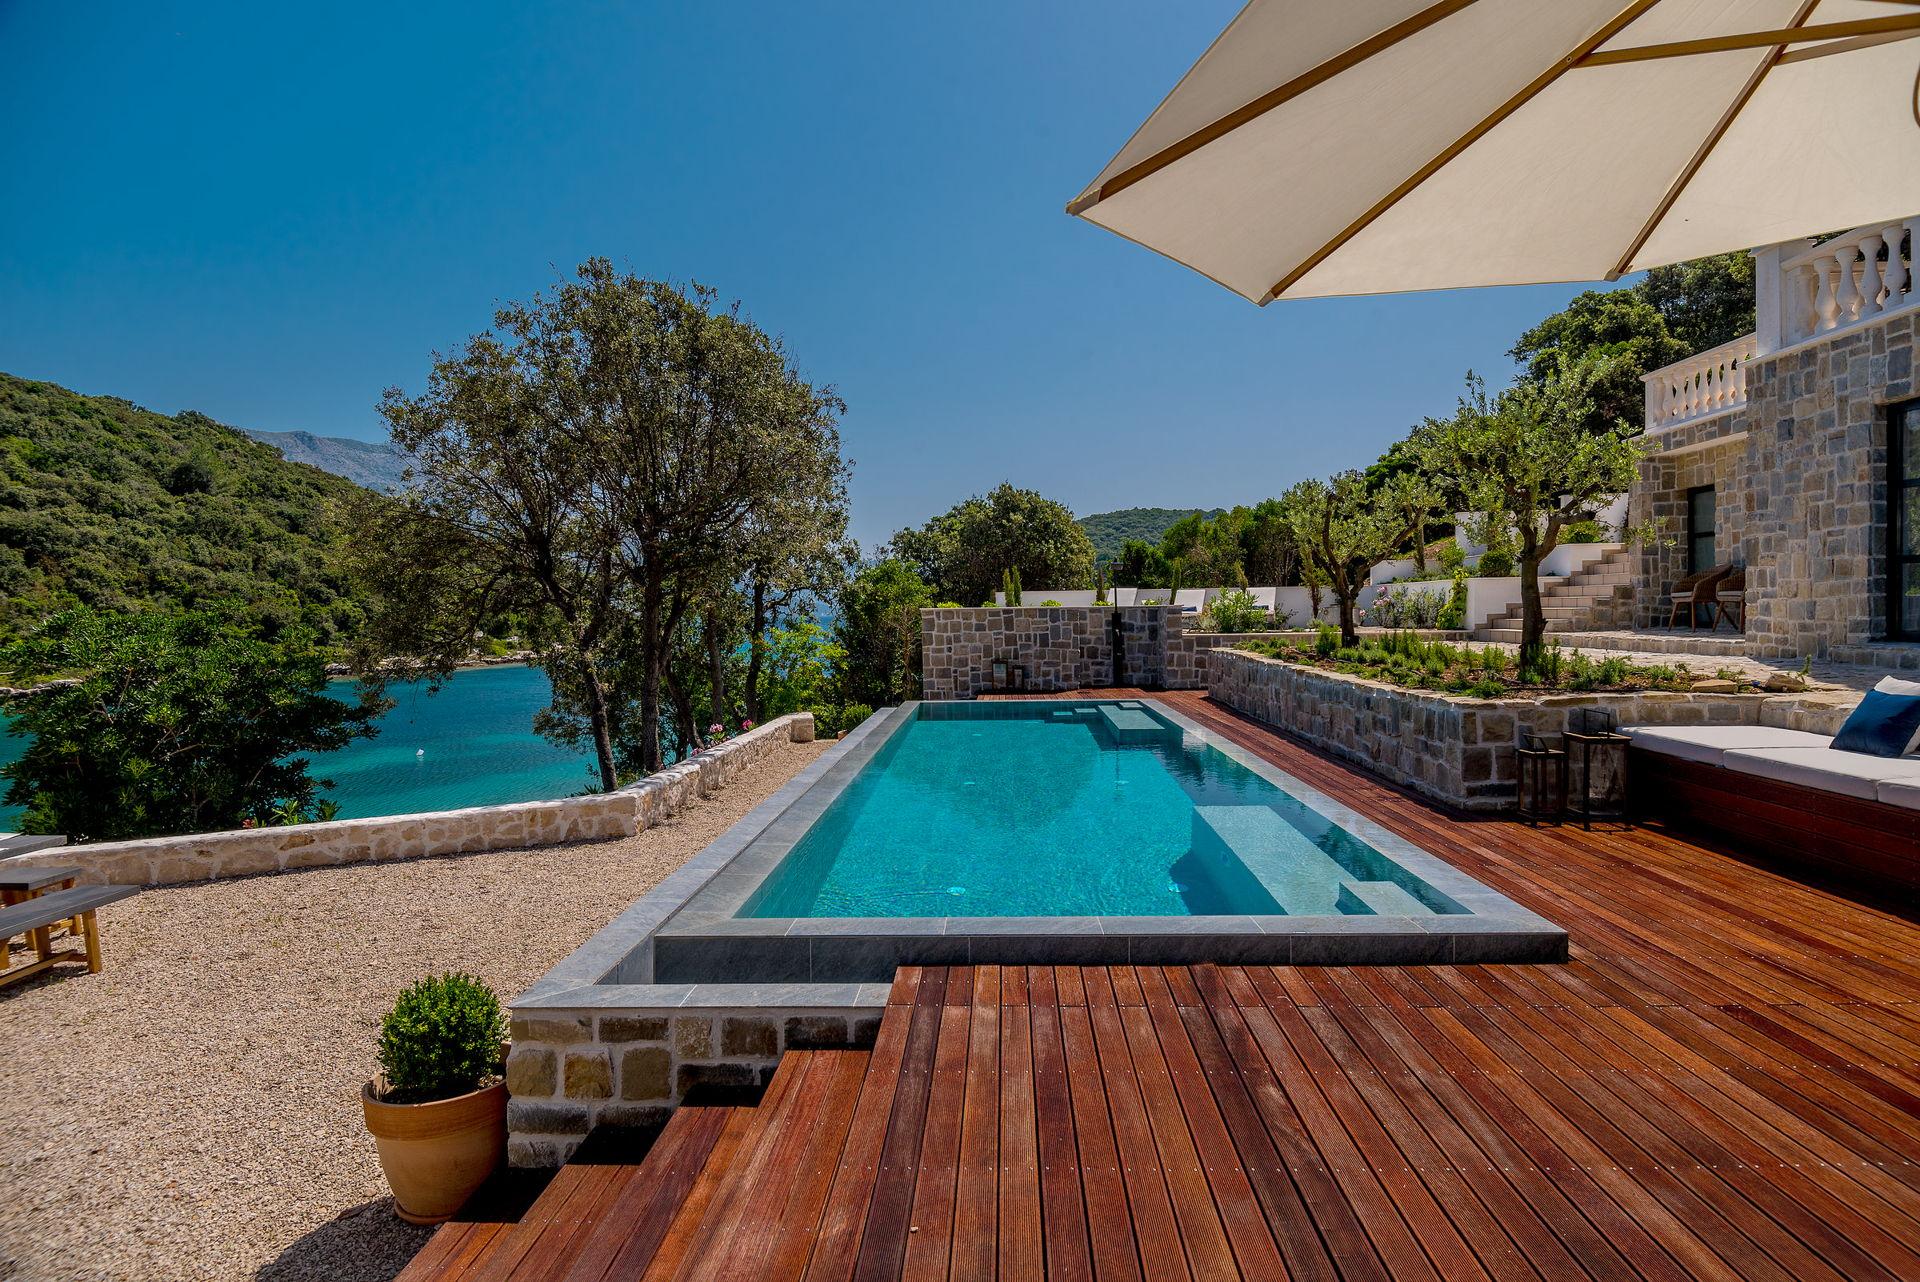 Real Estate Croatia